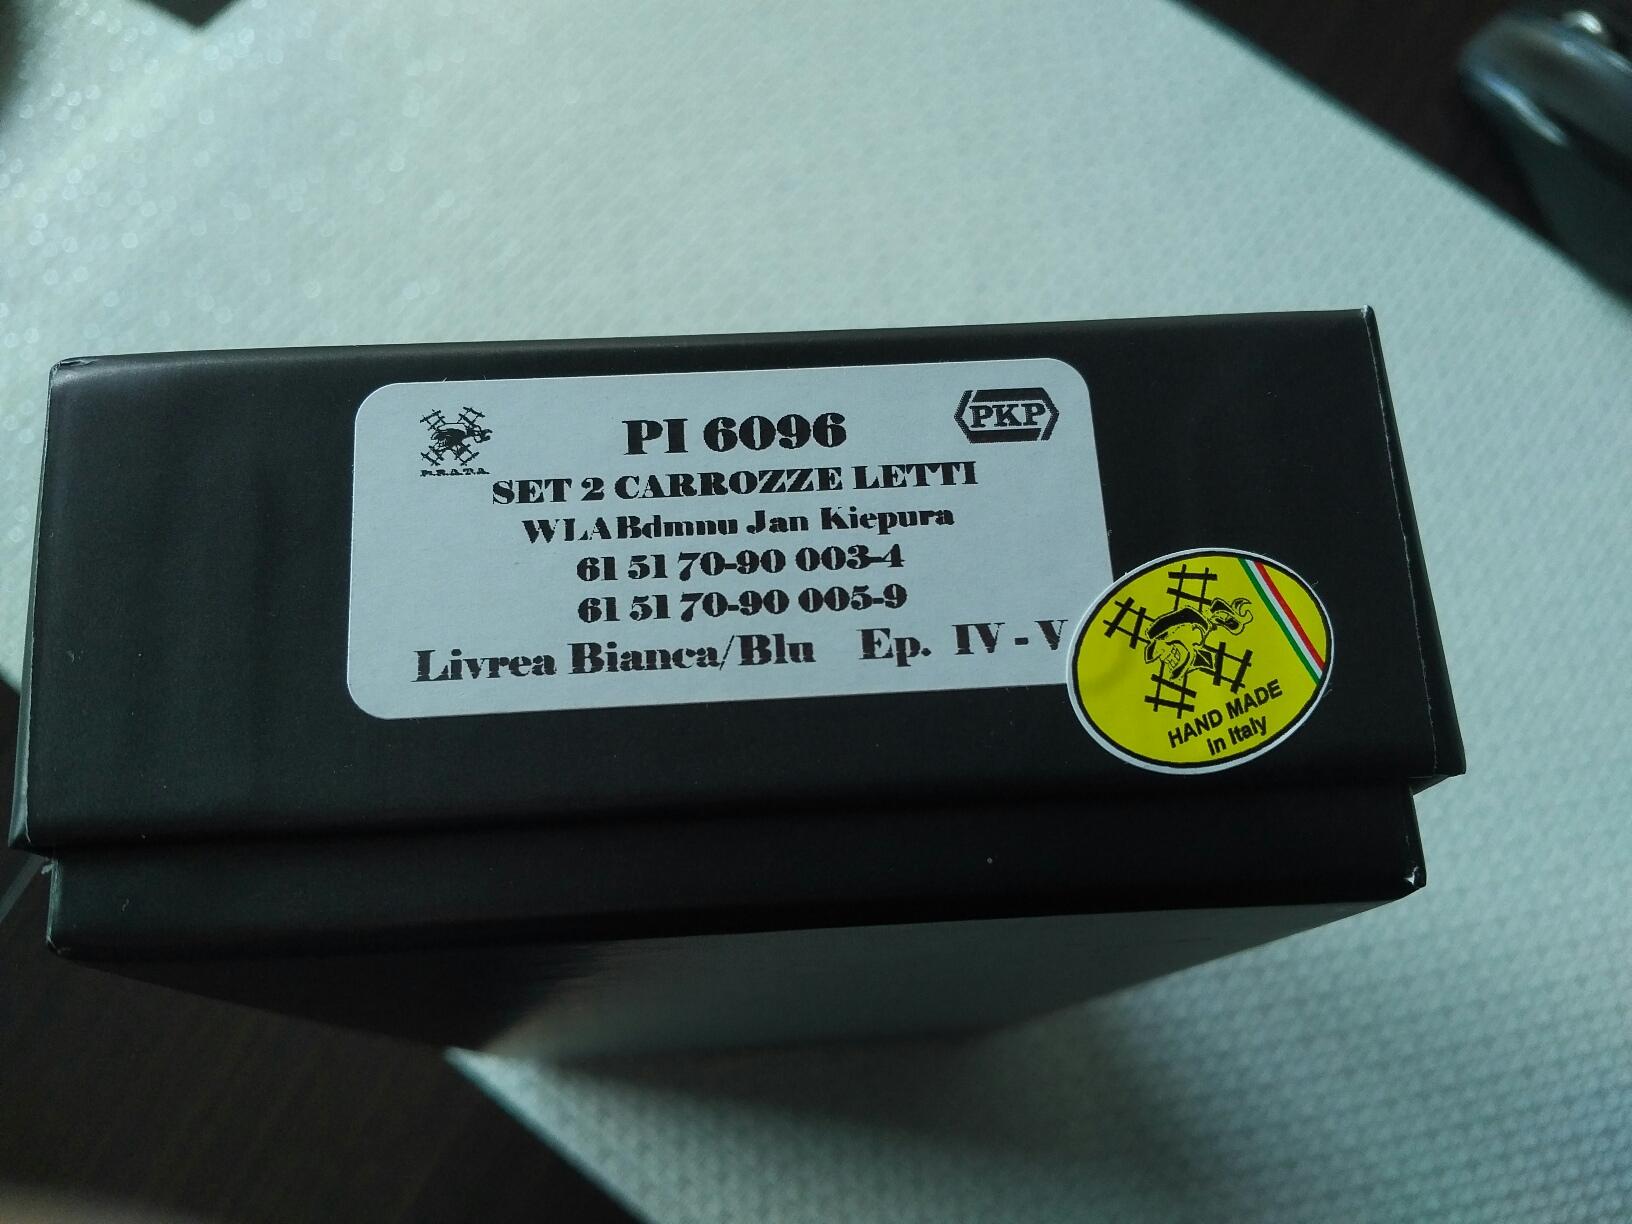 tmp-cam-1379217928.jpg